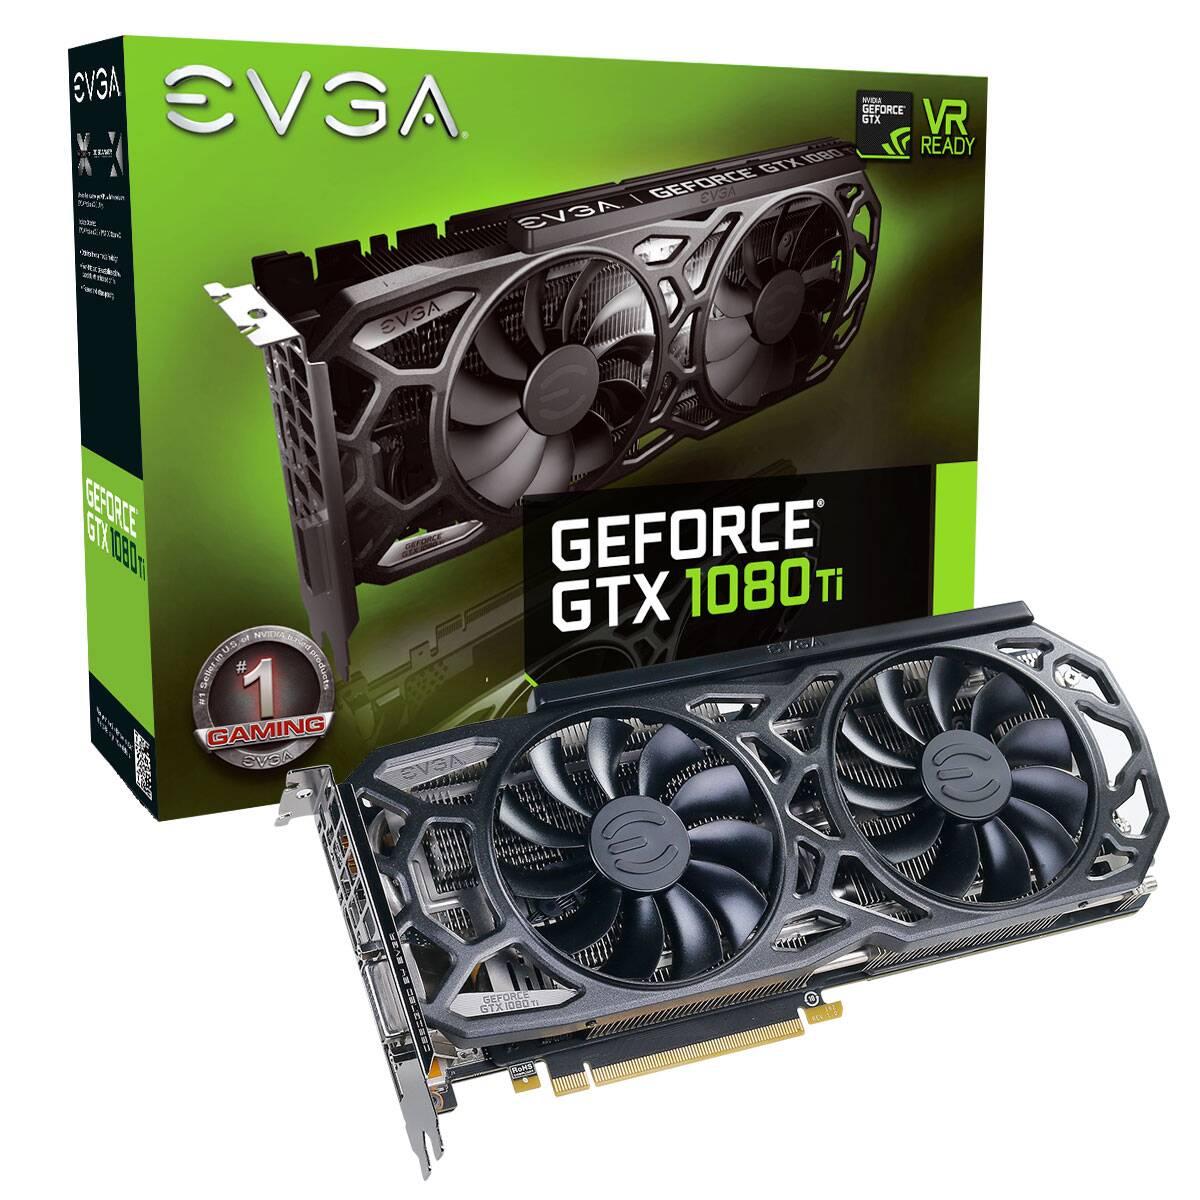 EVGA GeForce GTX 1080 Ti Black Edition GAMING - $699.95 + Free Shipping